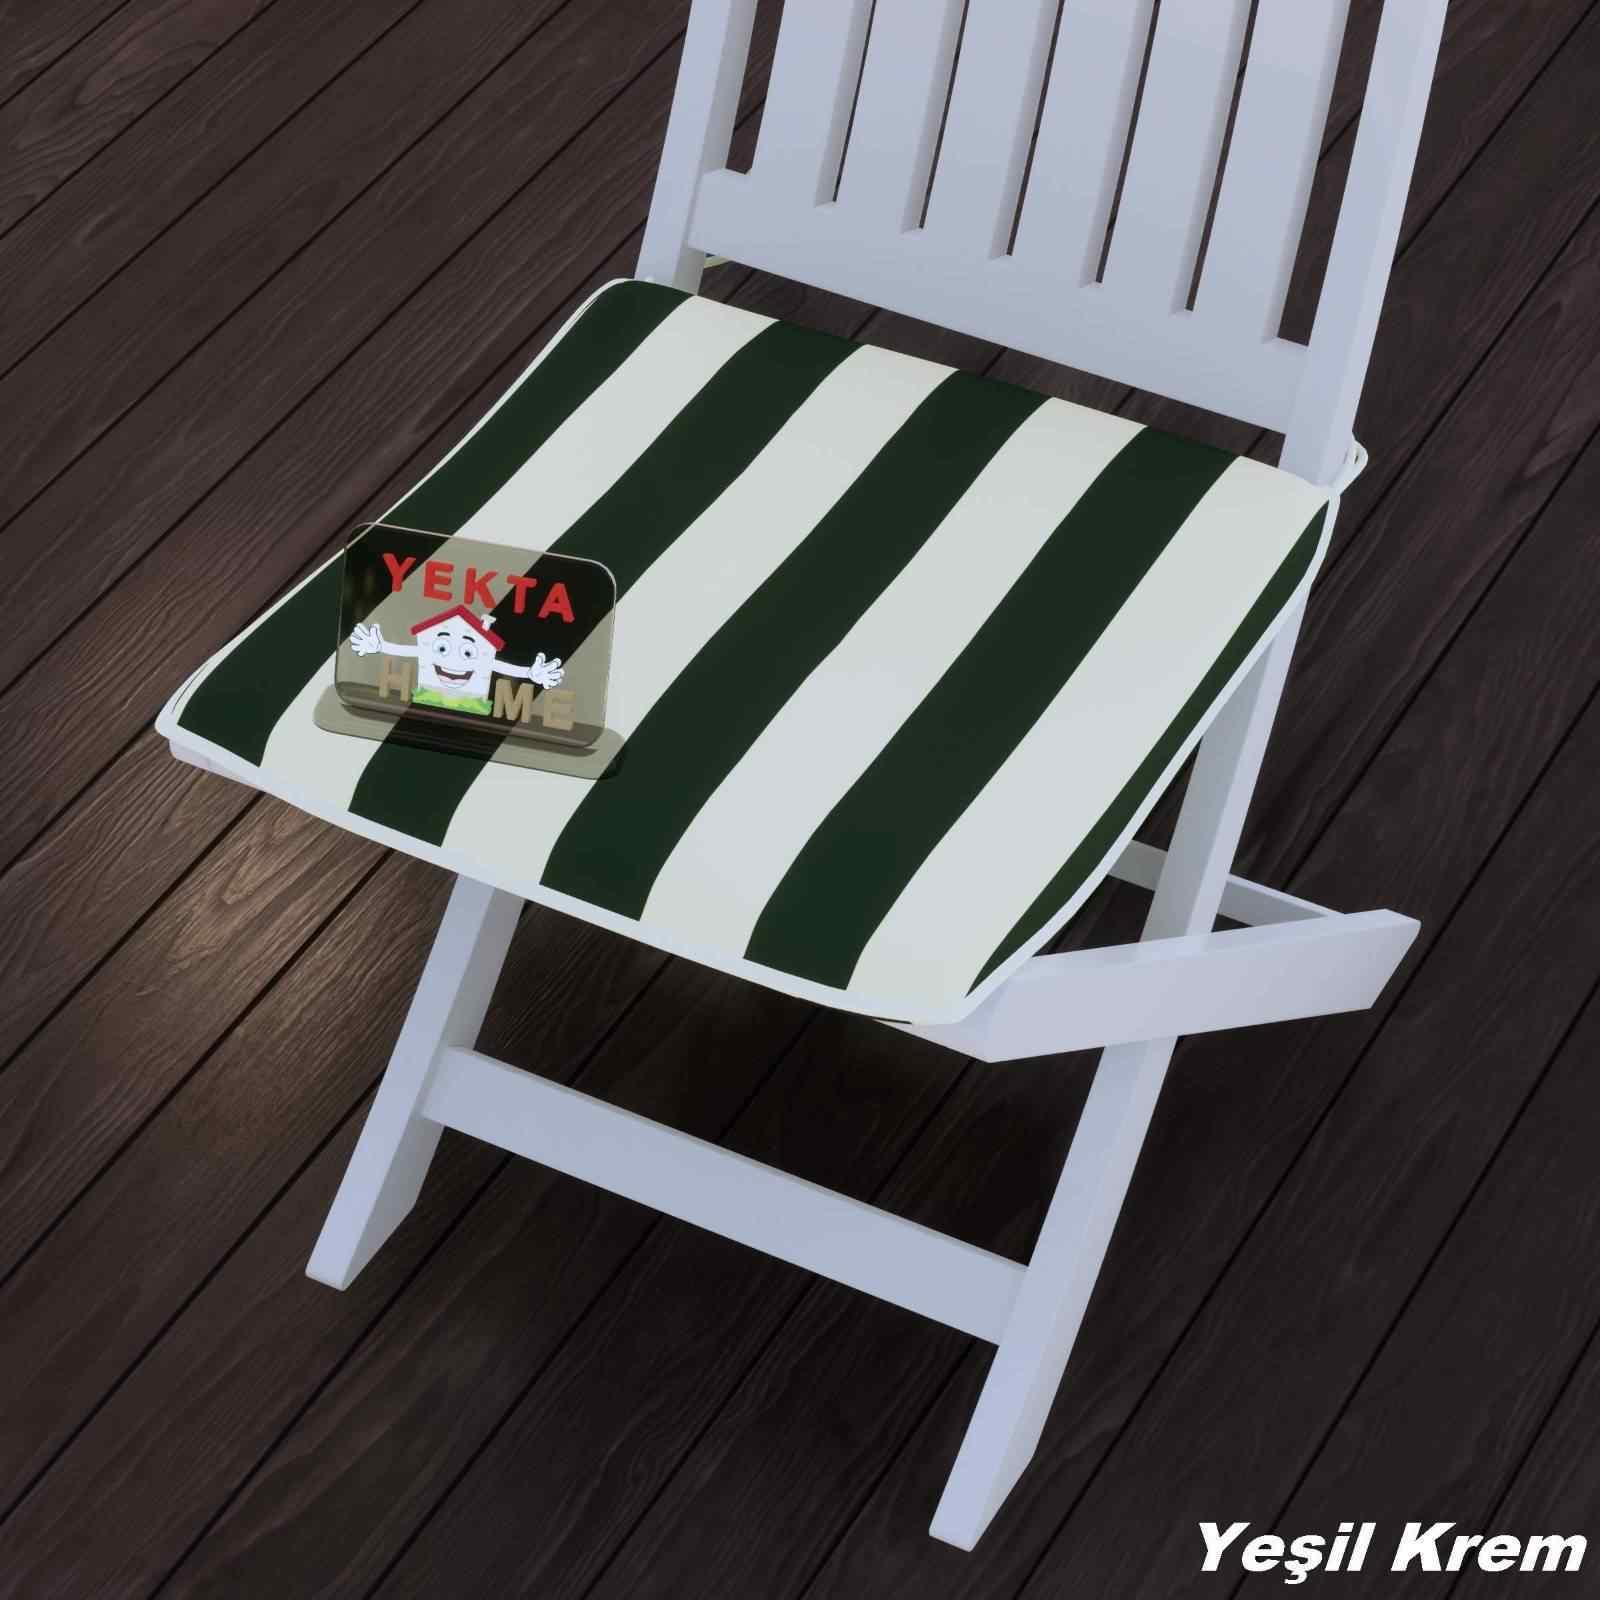 Sandalye Minderi - Rattan Koltuk Minderi 6 Adet Yeşil Krem